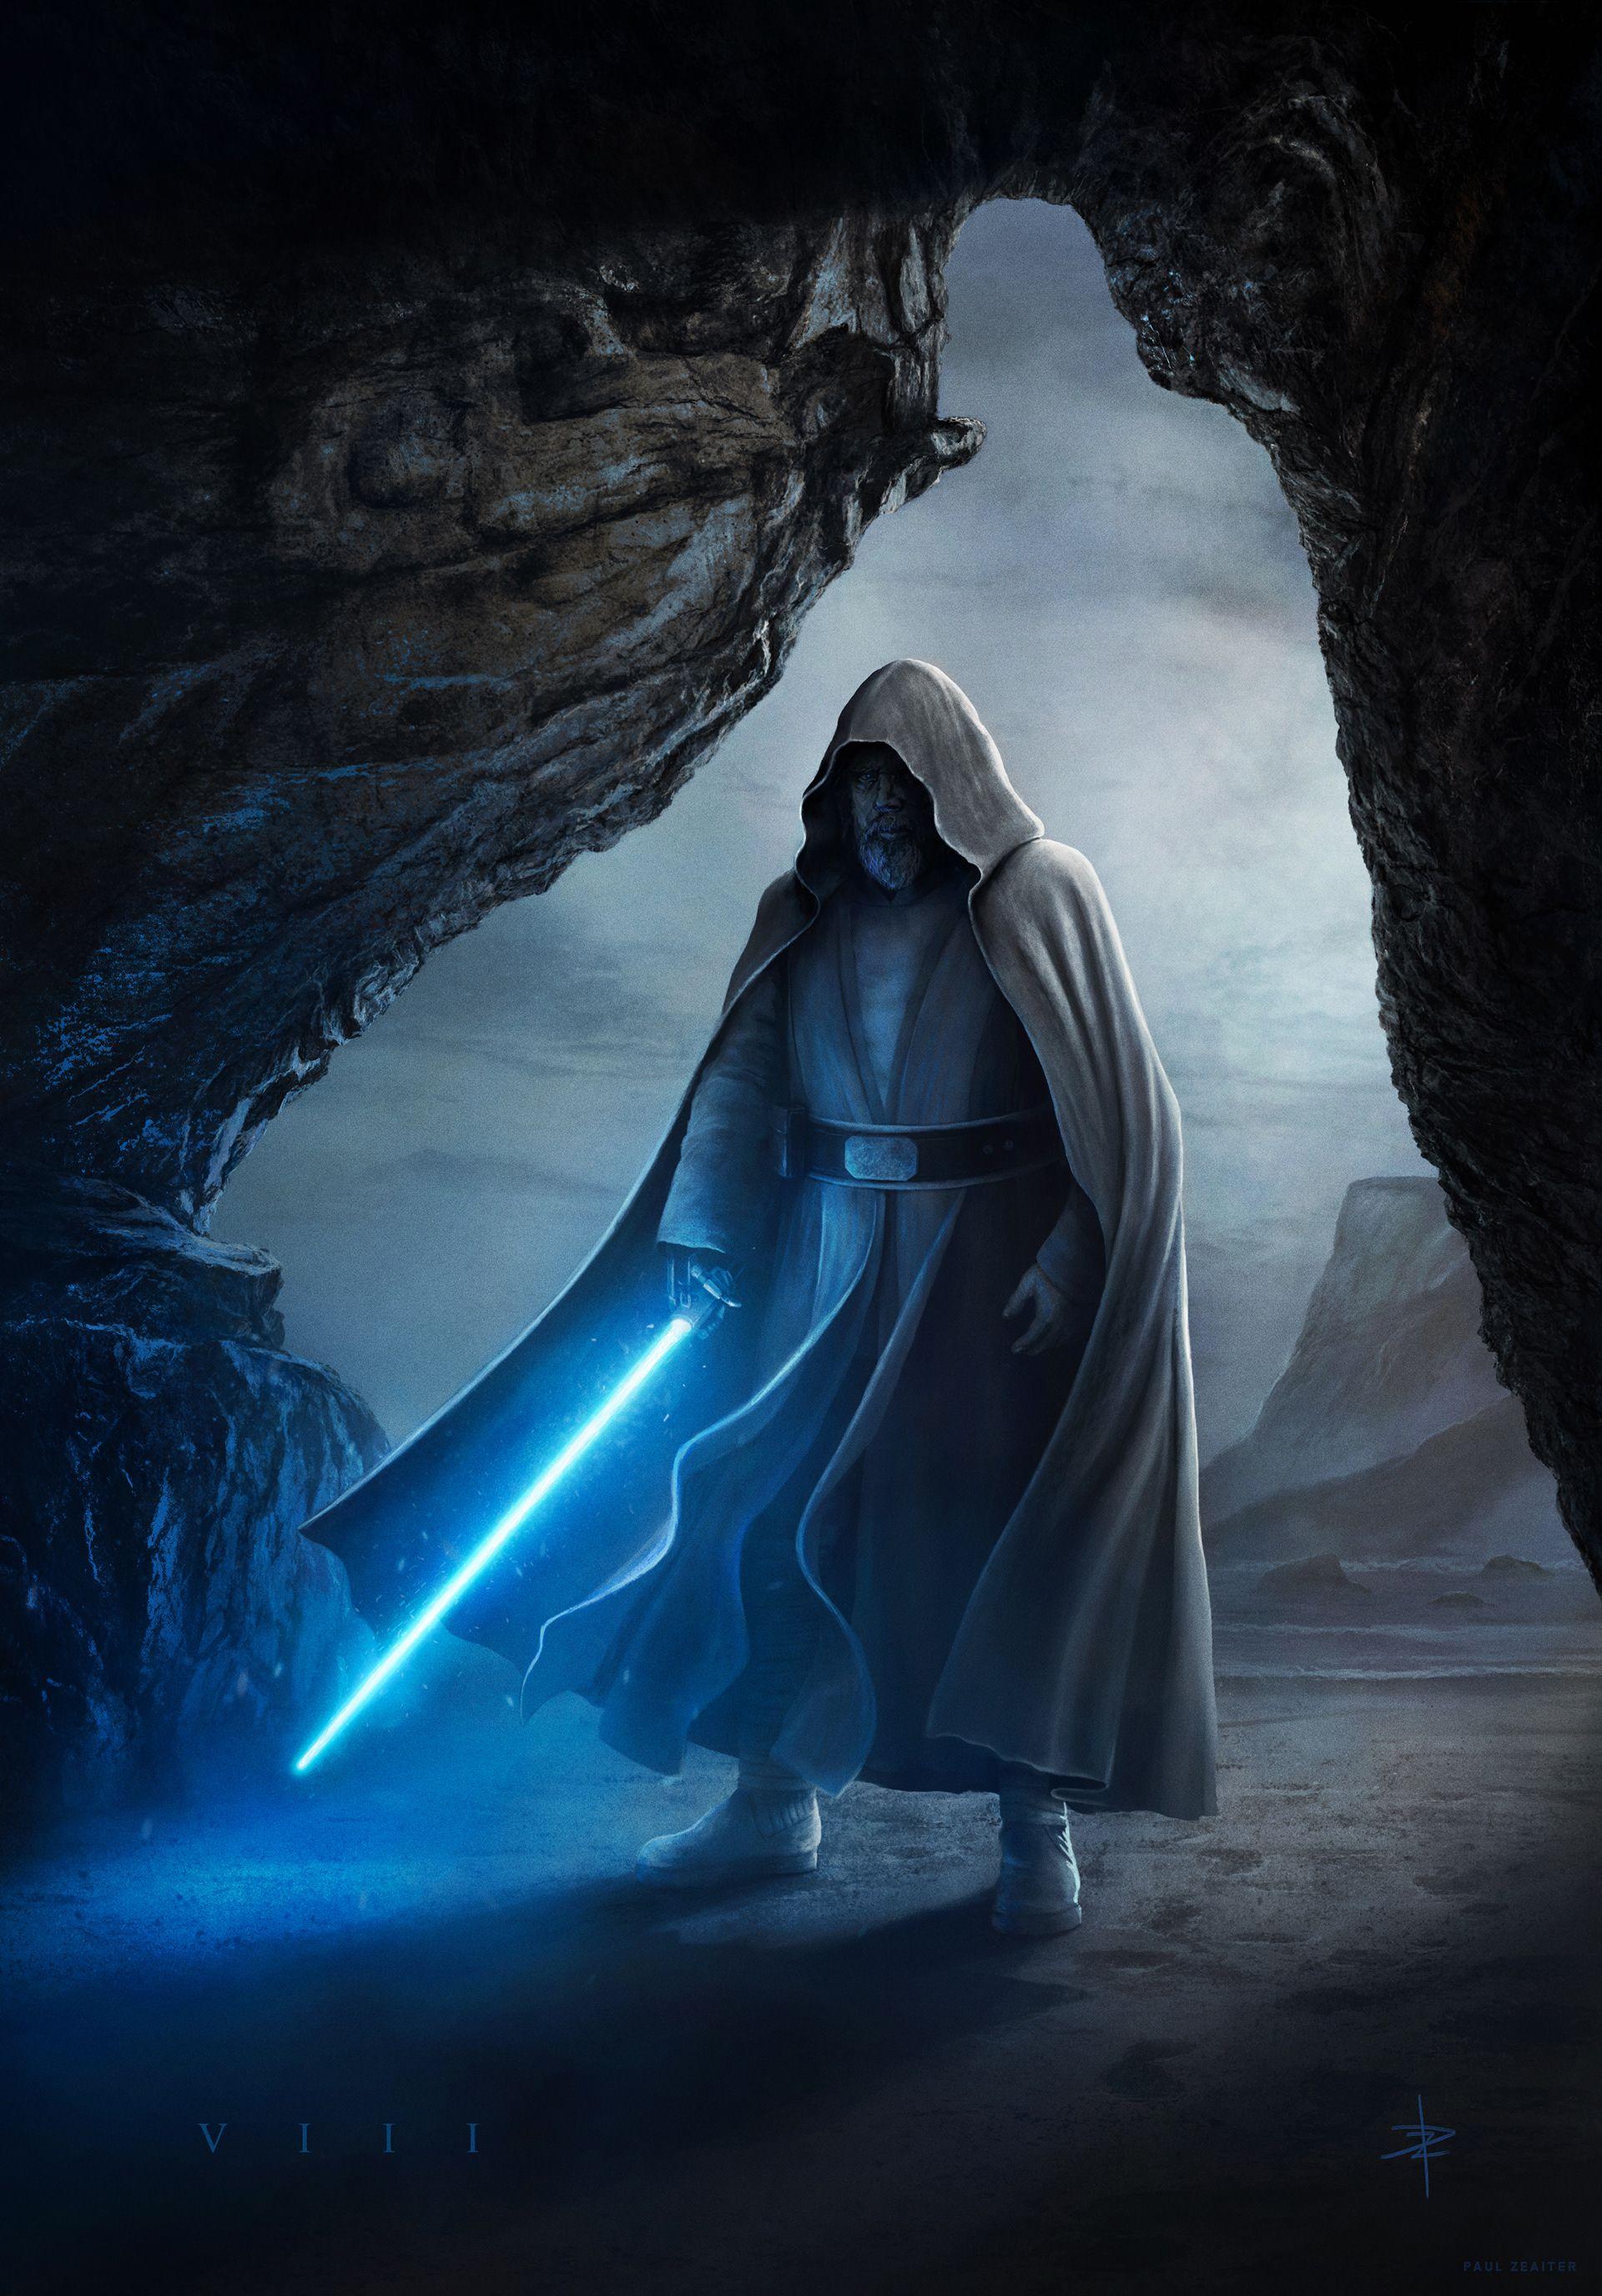 Veil Star Wars Fan Art. Digital Painting Of